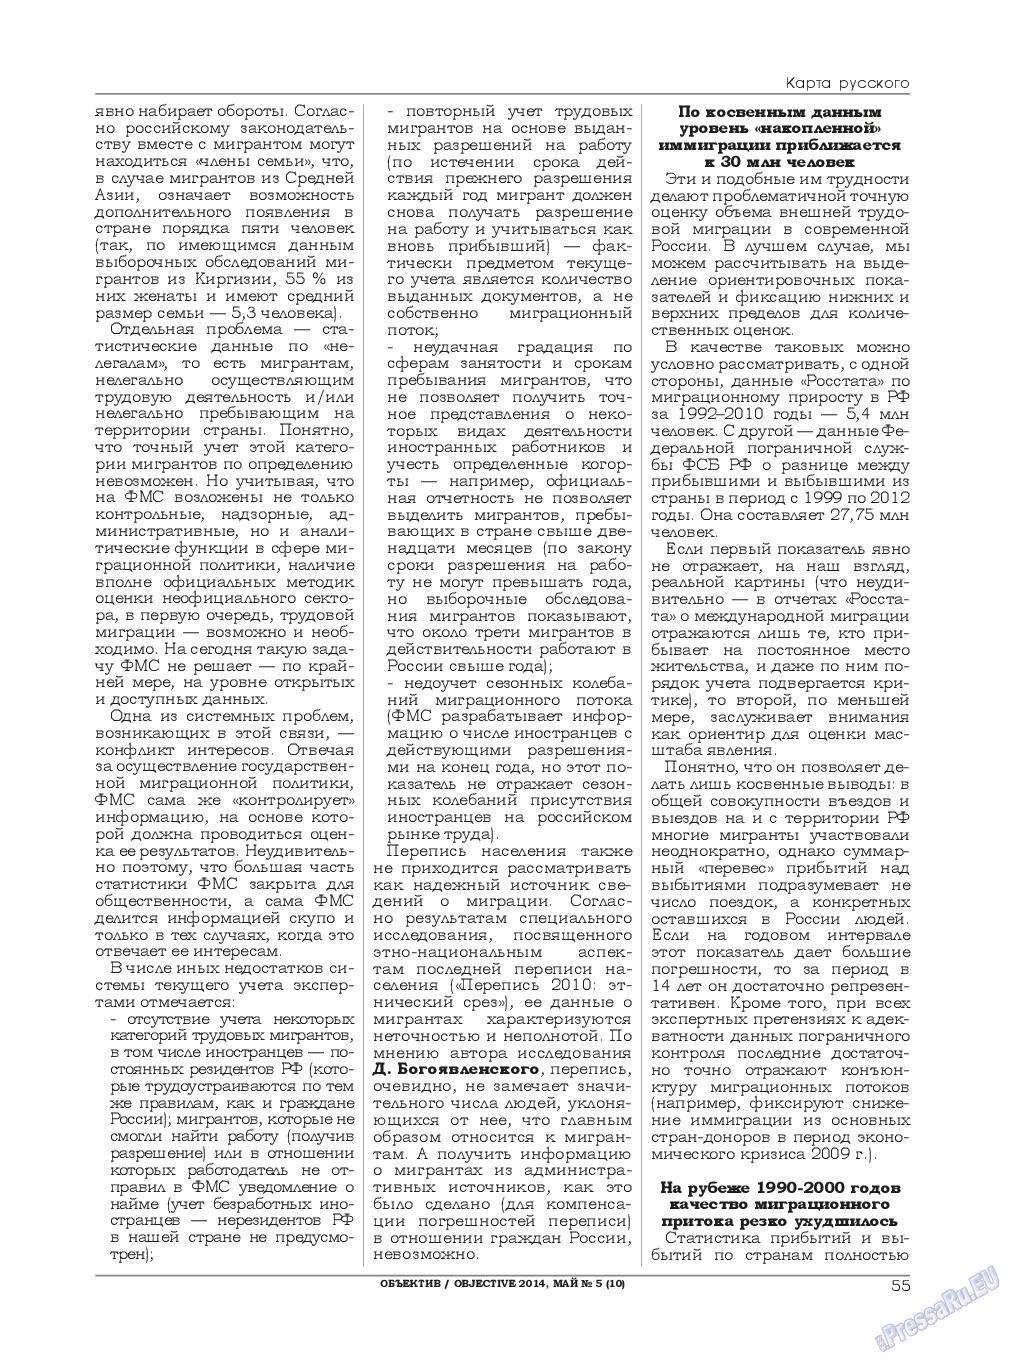 Объектив EU (журнал). 2014 год, номер 5, стр. 55